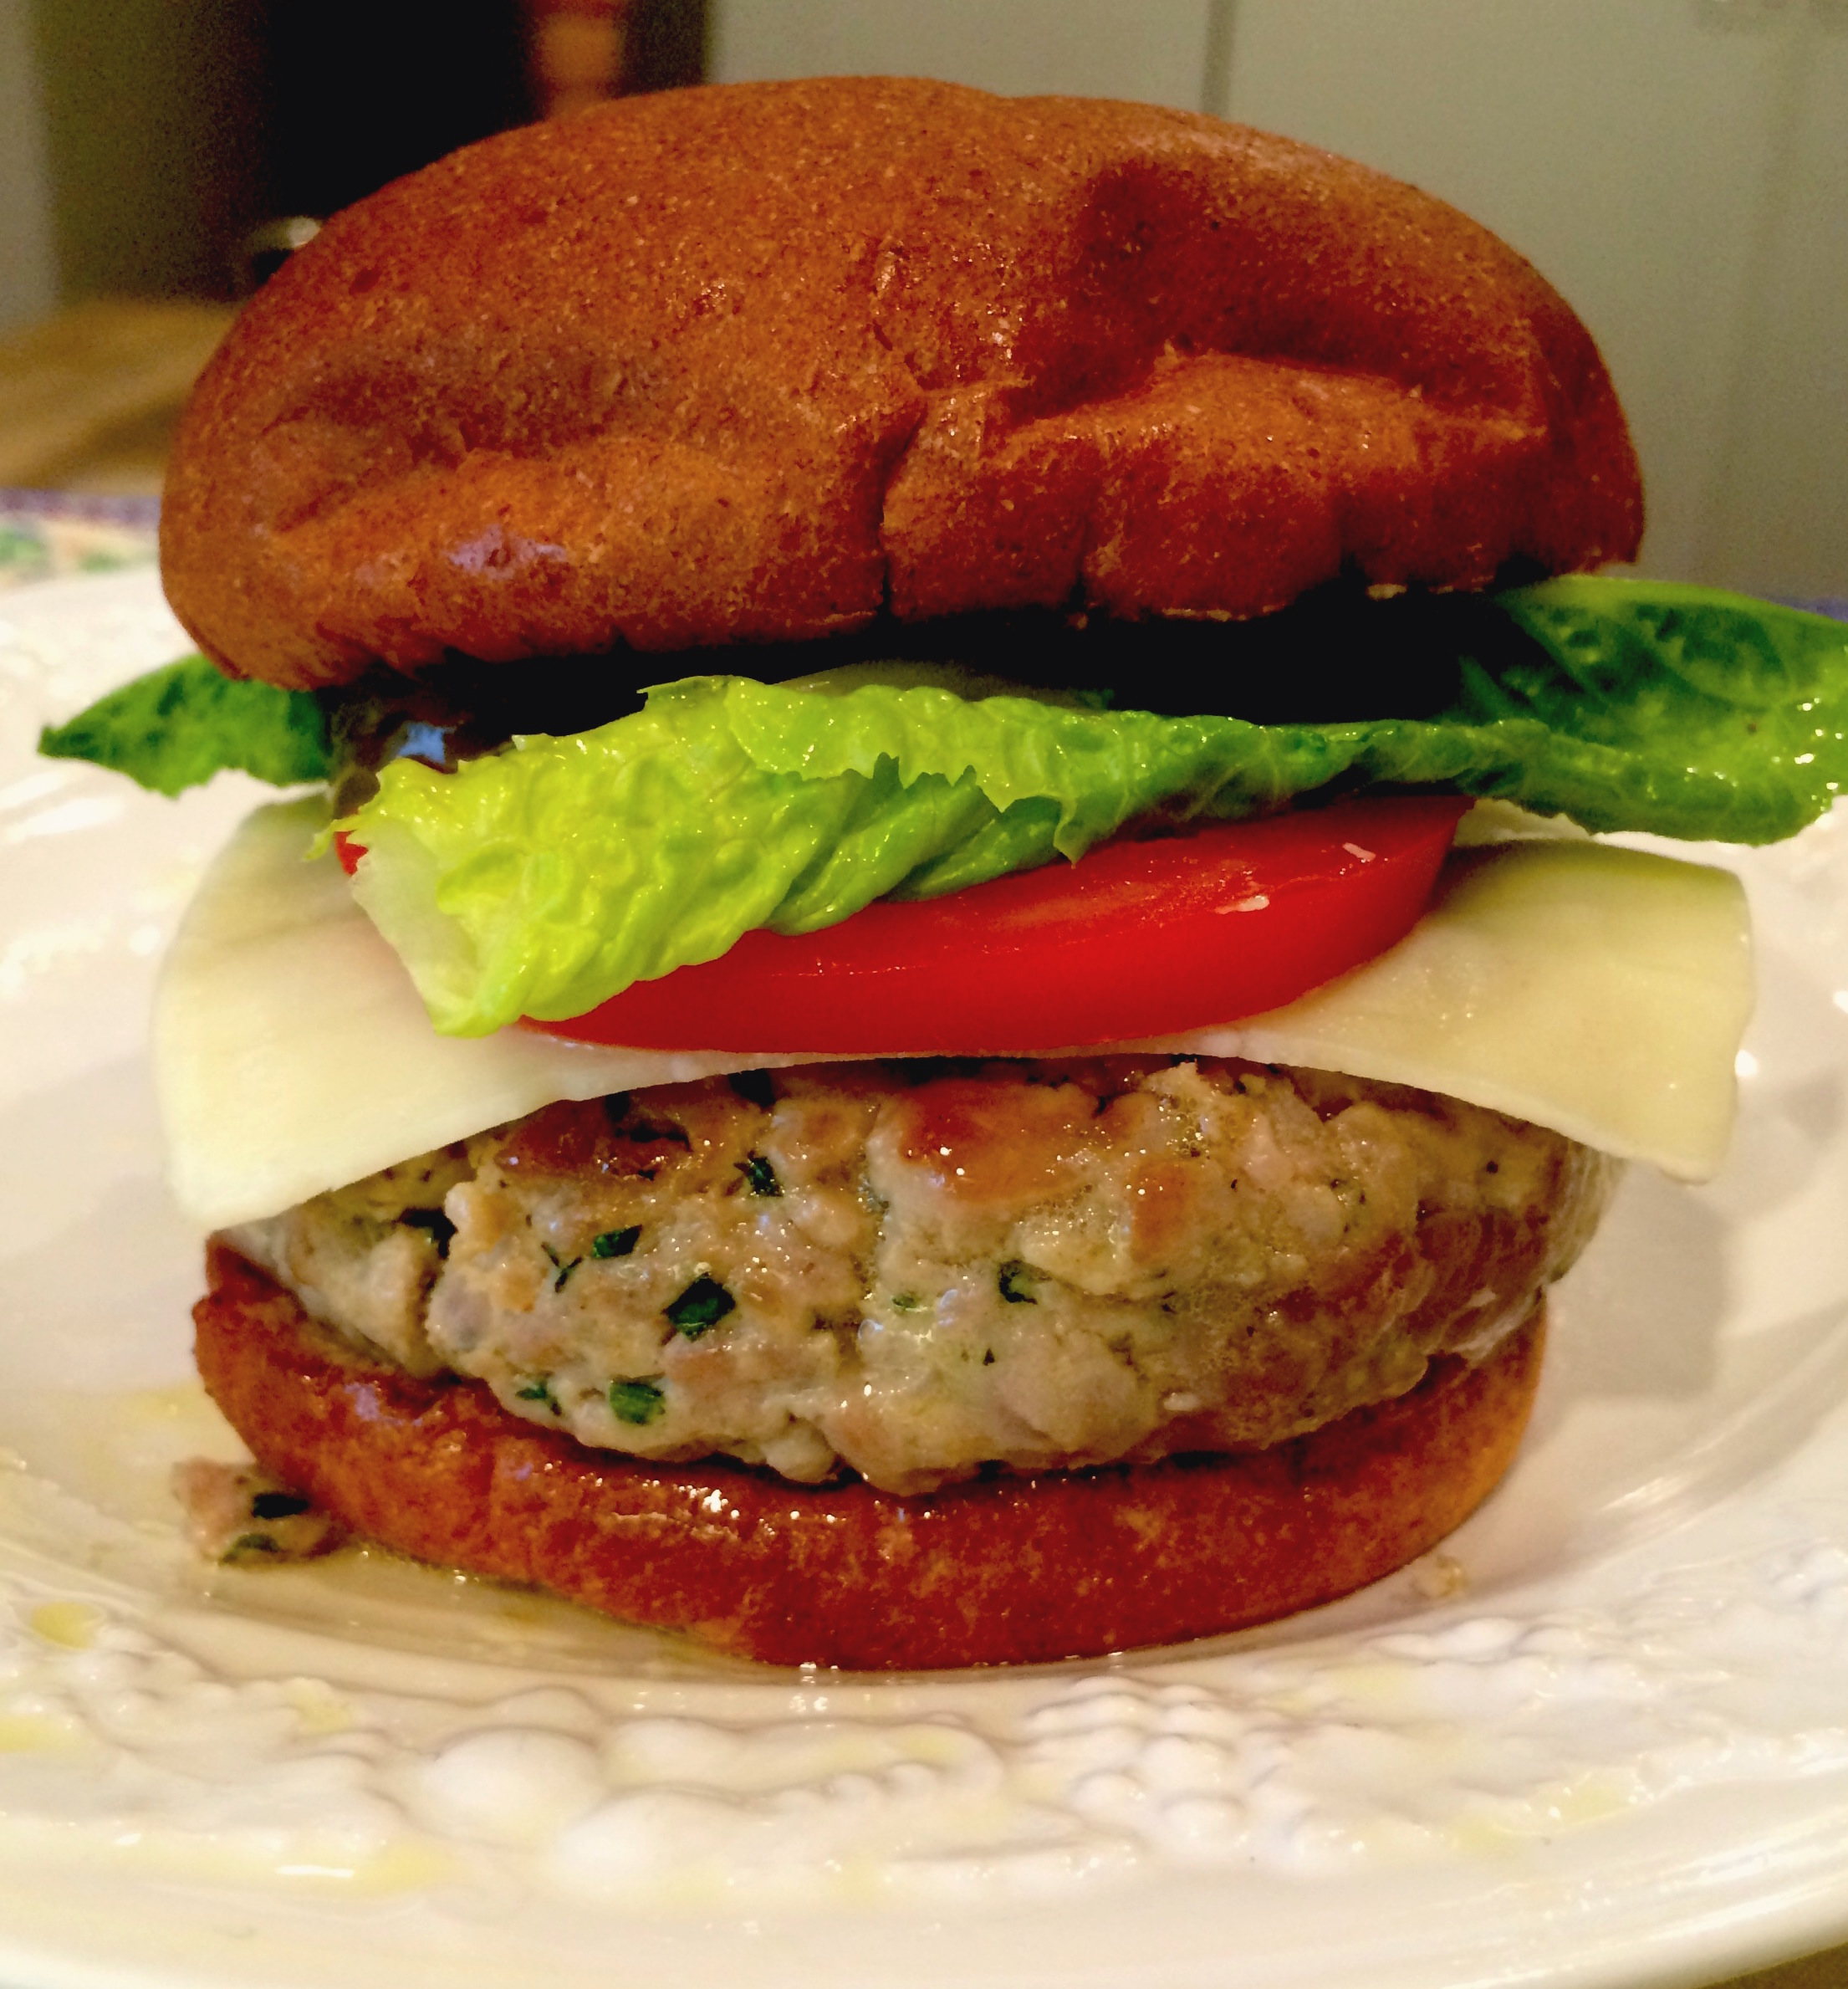 Tuna burger closed